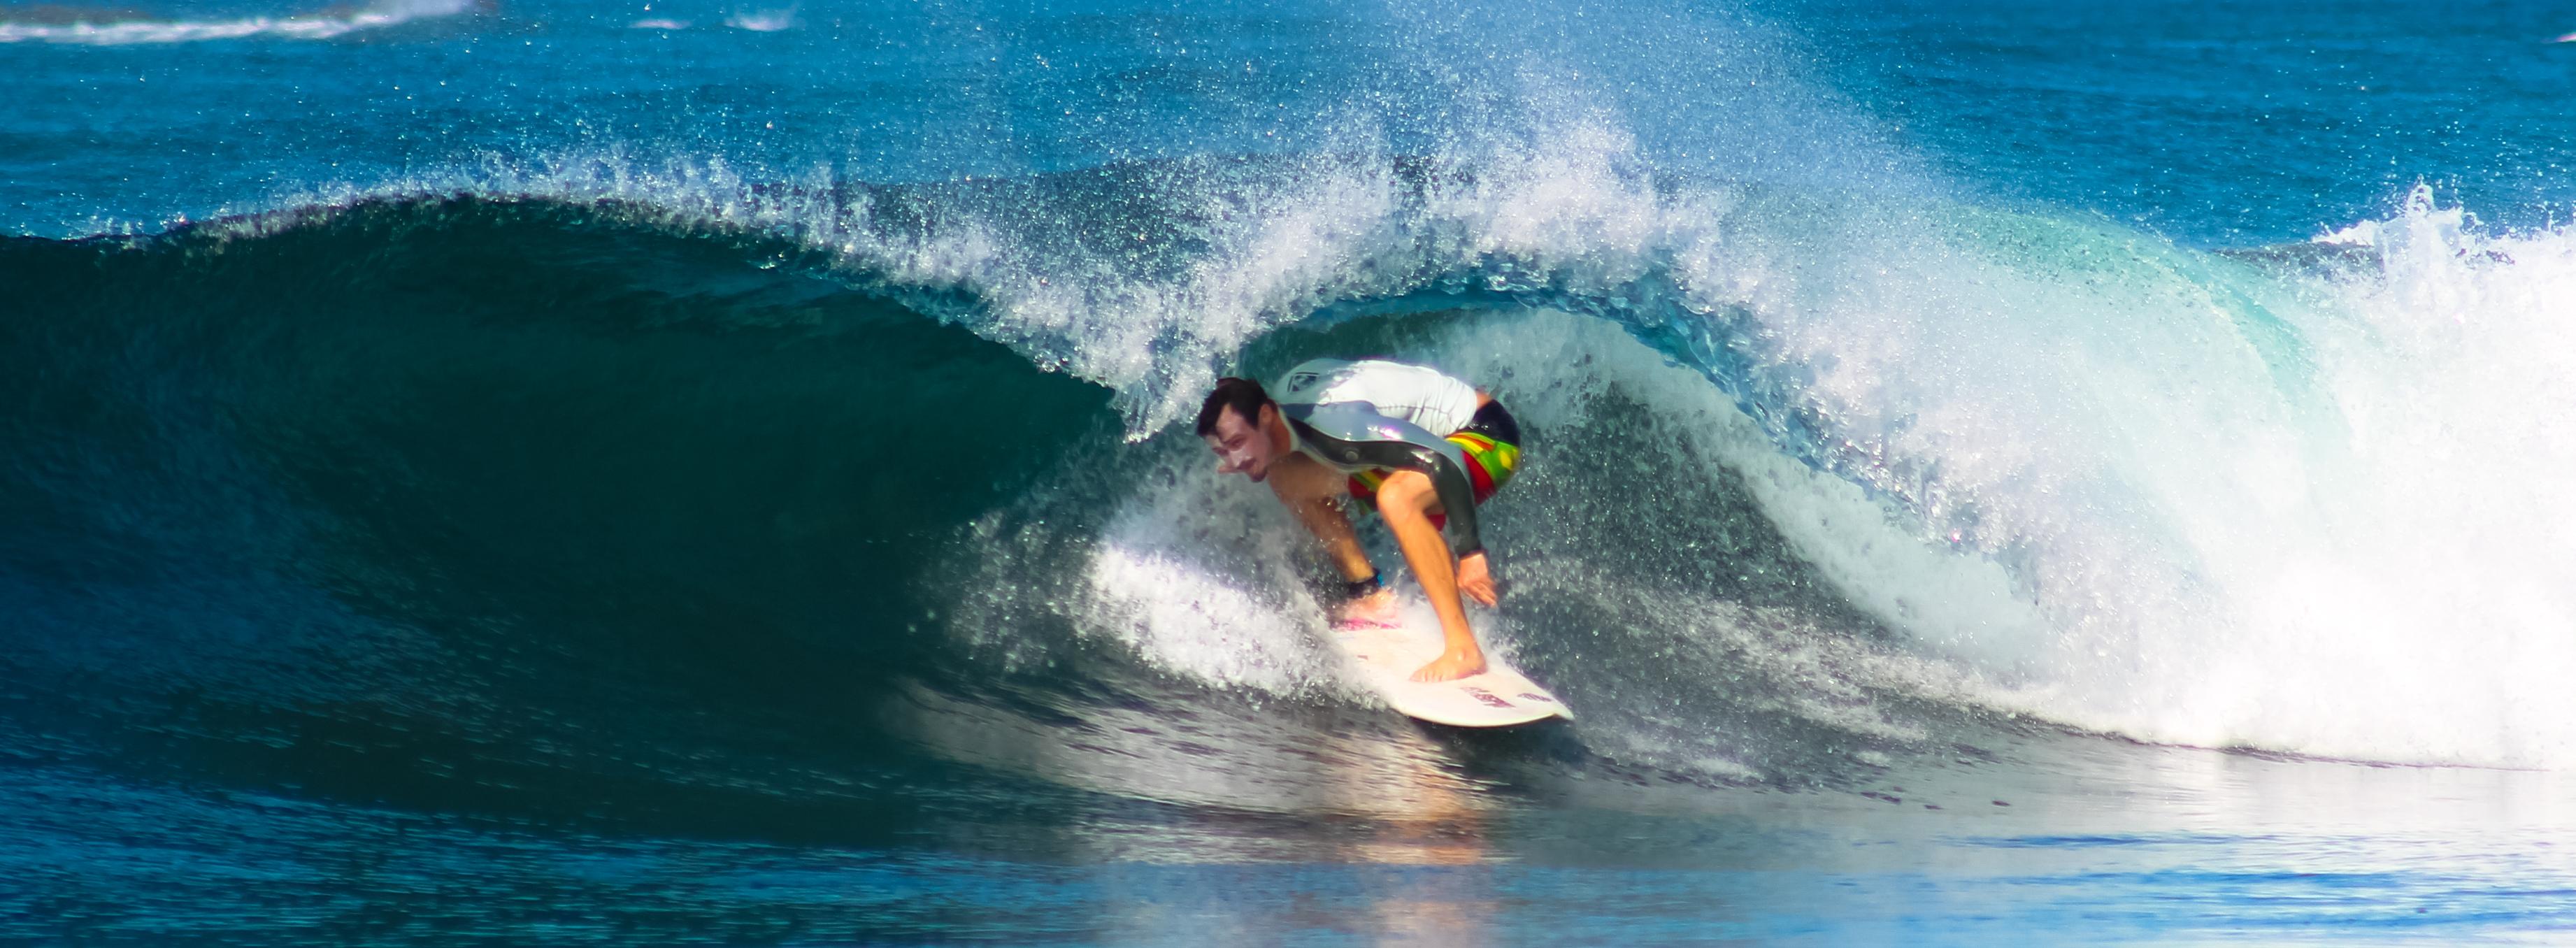 diabetic surfing Marbella Gem Barrel